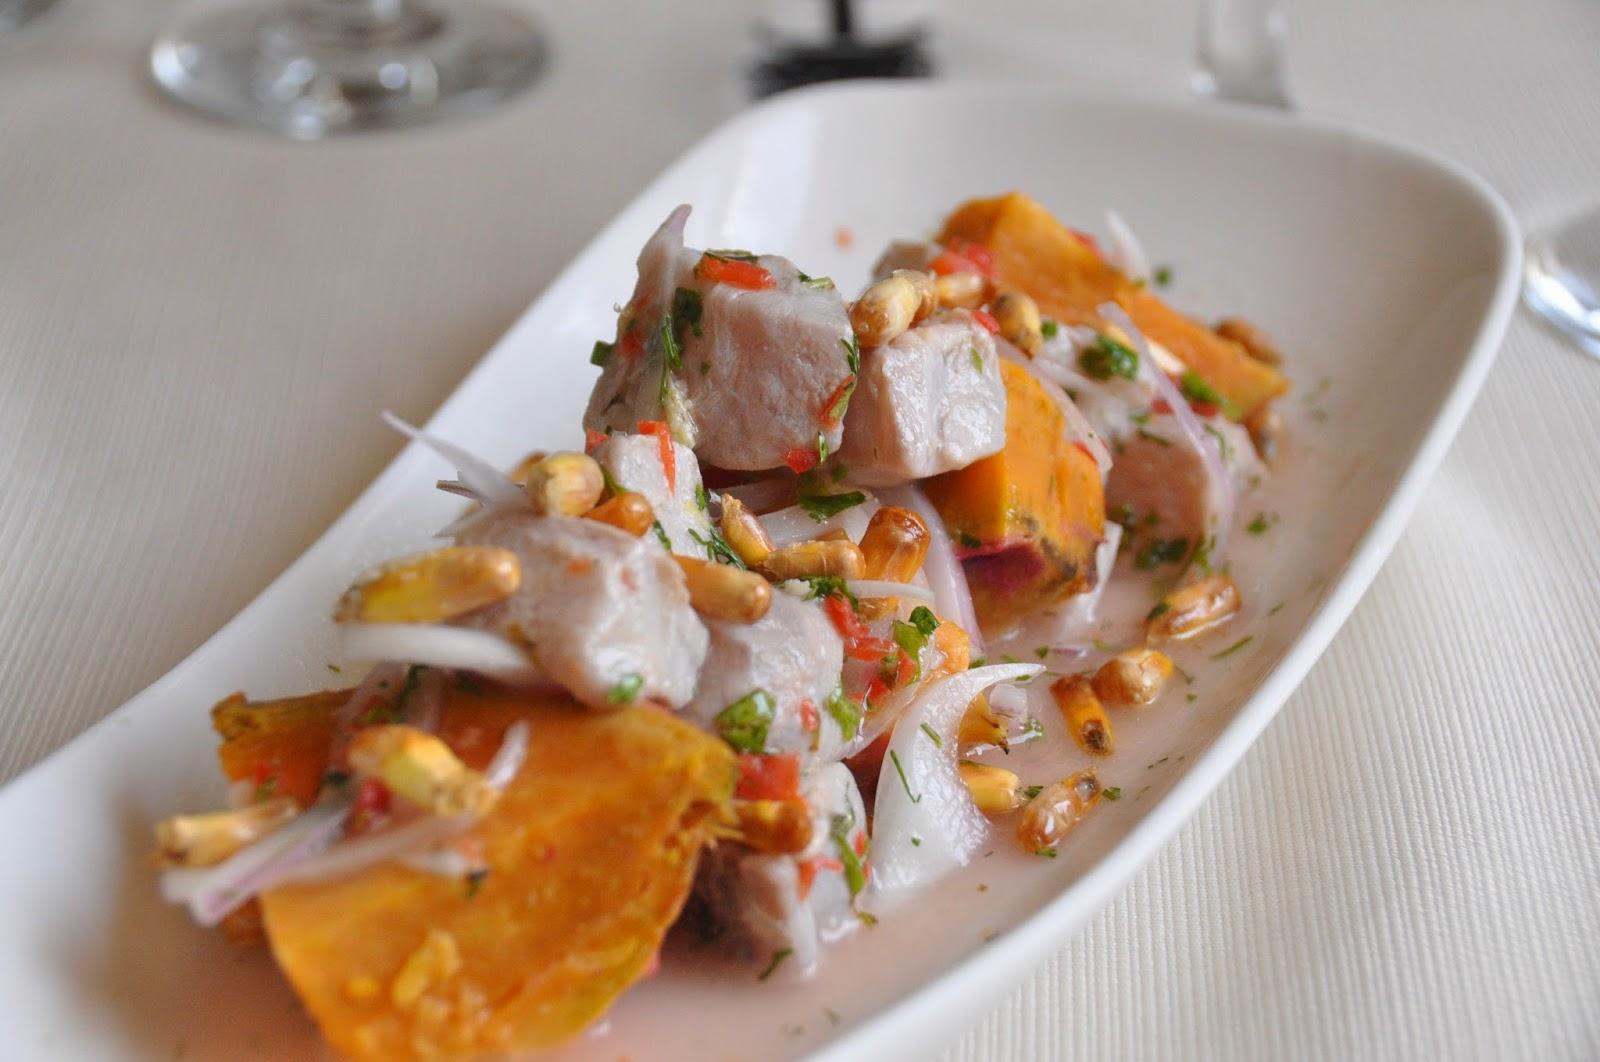 Ceviche with mahi mahi and sweet potatoes